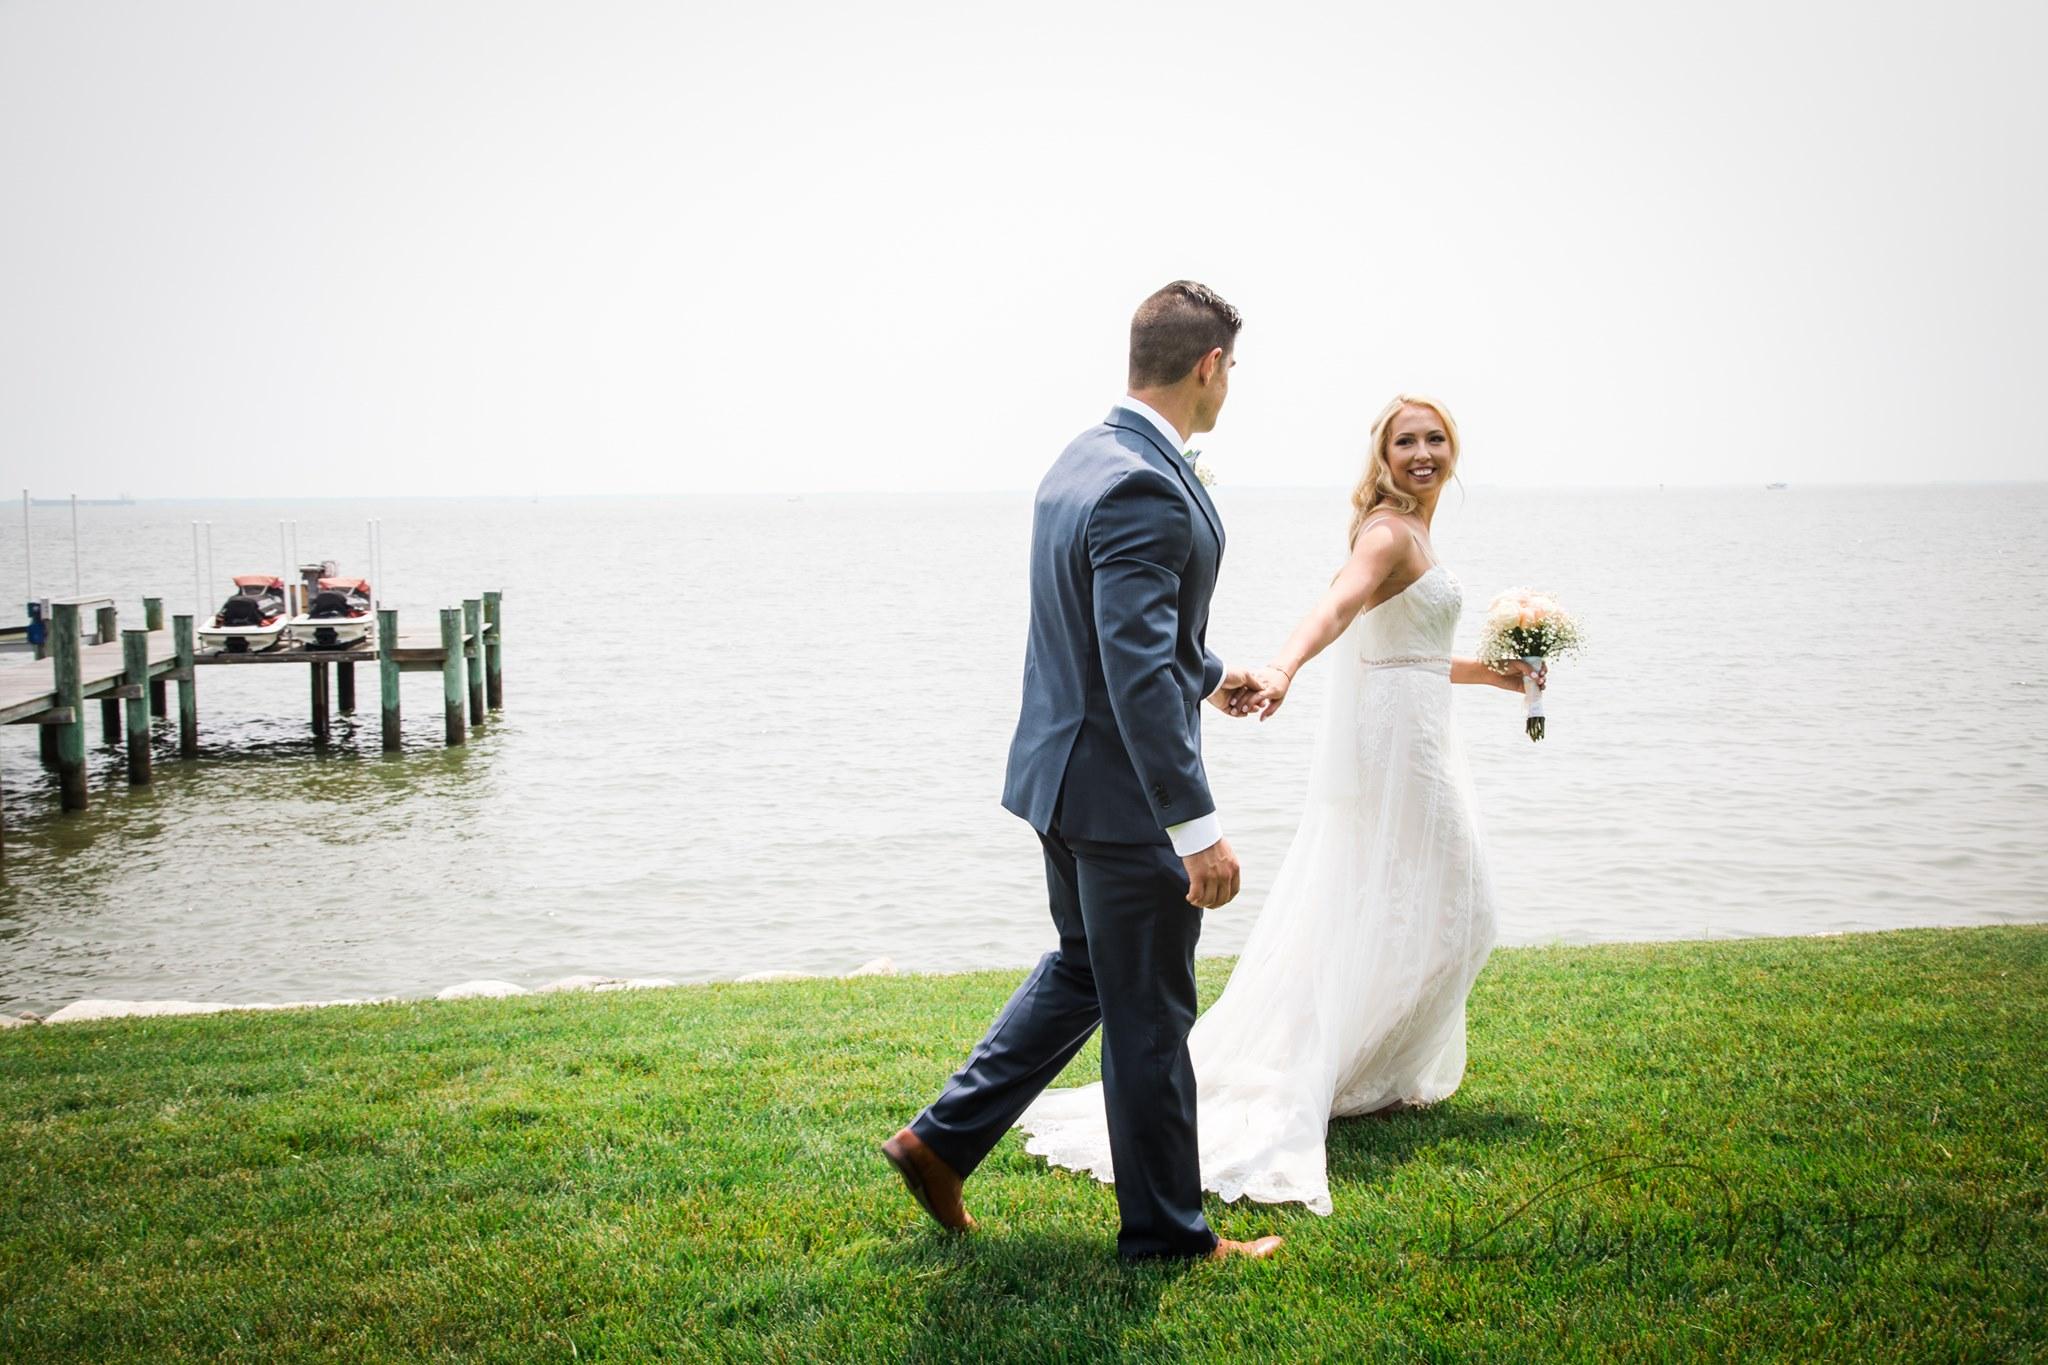 waterfront wedding walk, easton md wedding venue, consignment wedding dress, bridal shop